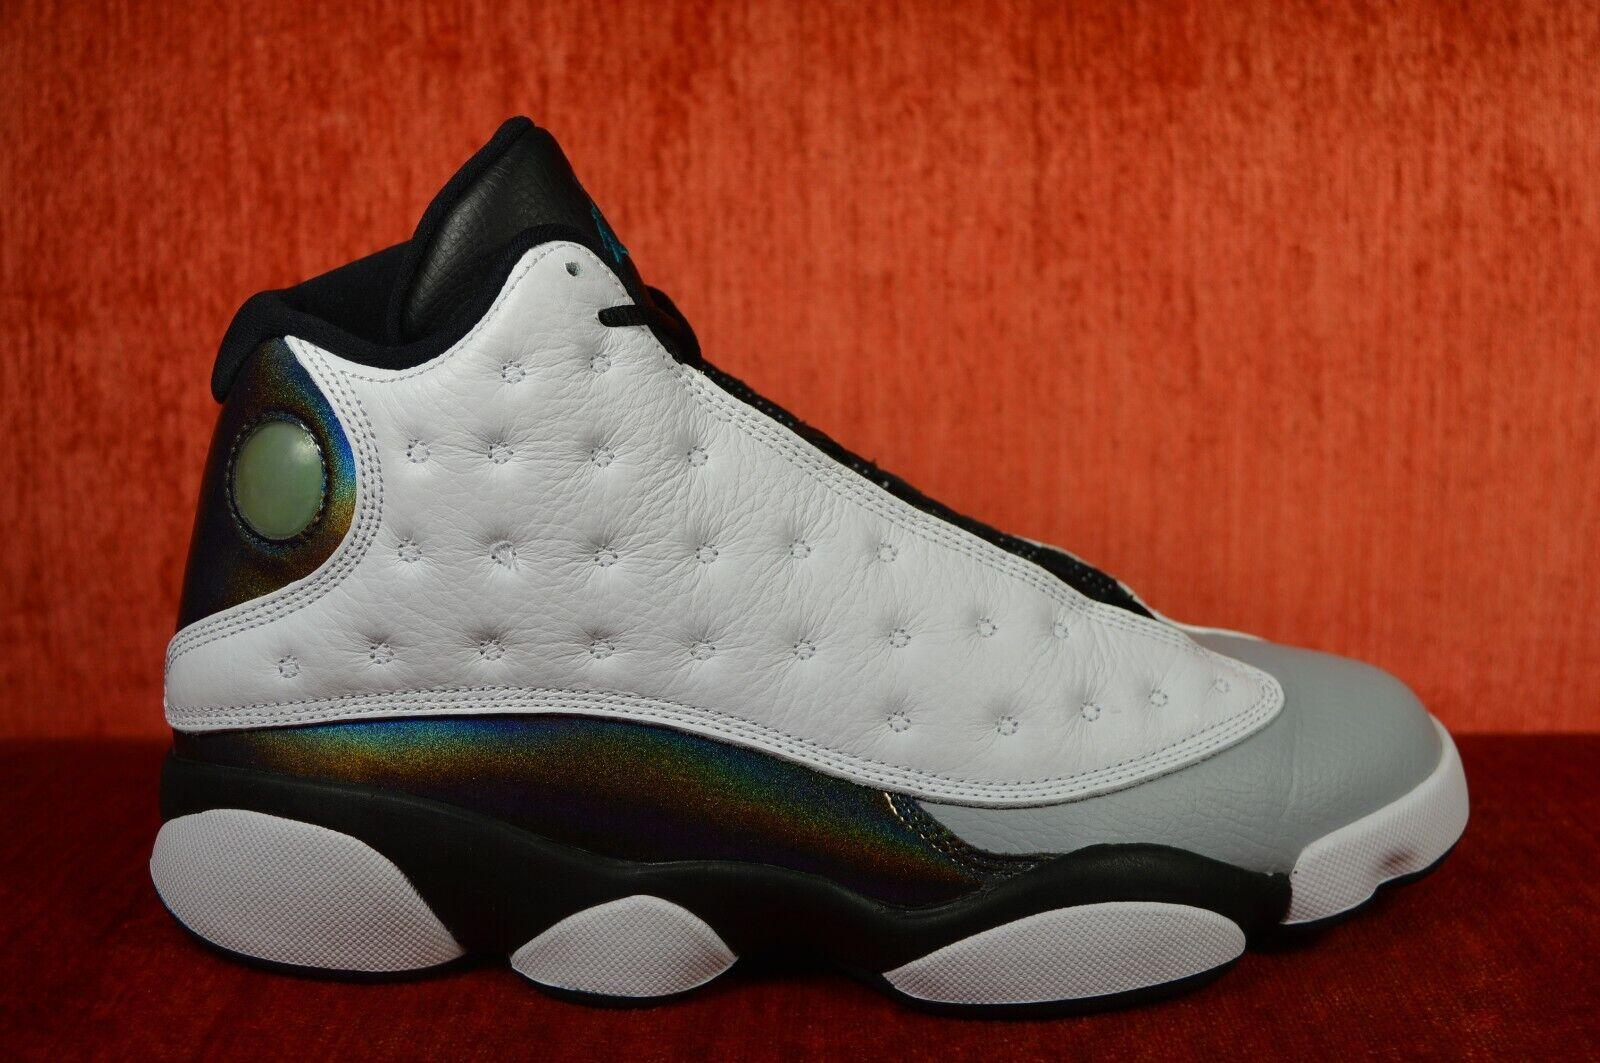 WORN TWICE Nike Air Jordan XIII Hologram 13 Barons White Grey 414571-115 Size 9